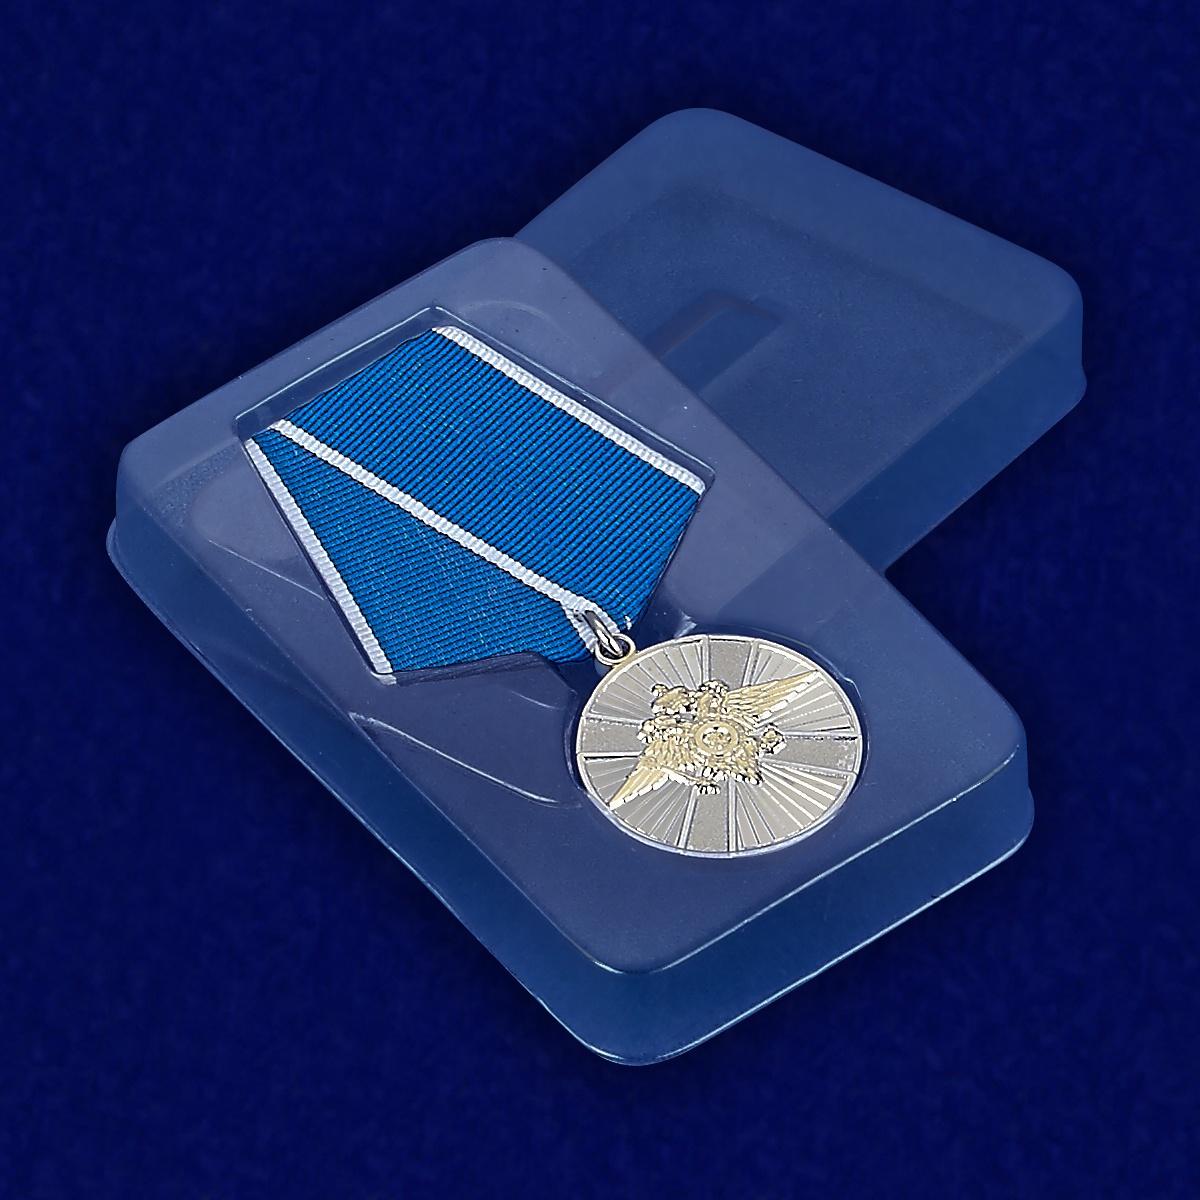 Медаль За заслуги в службе в особых условиях МВД РФ - вид в футляре